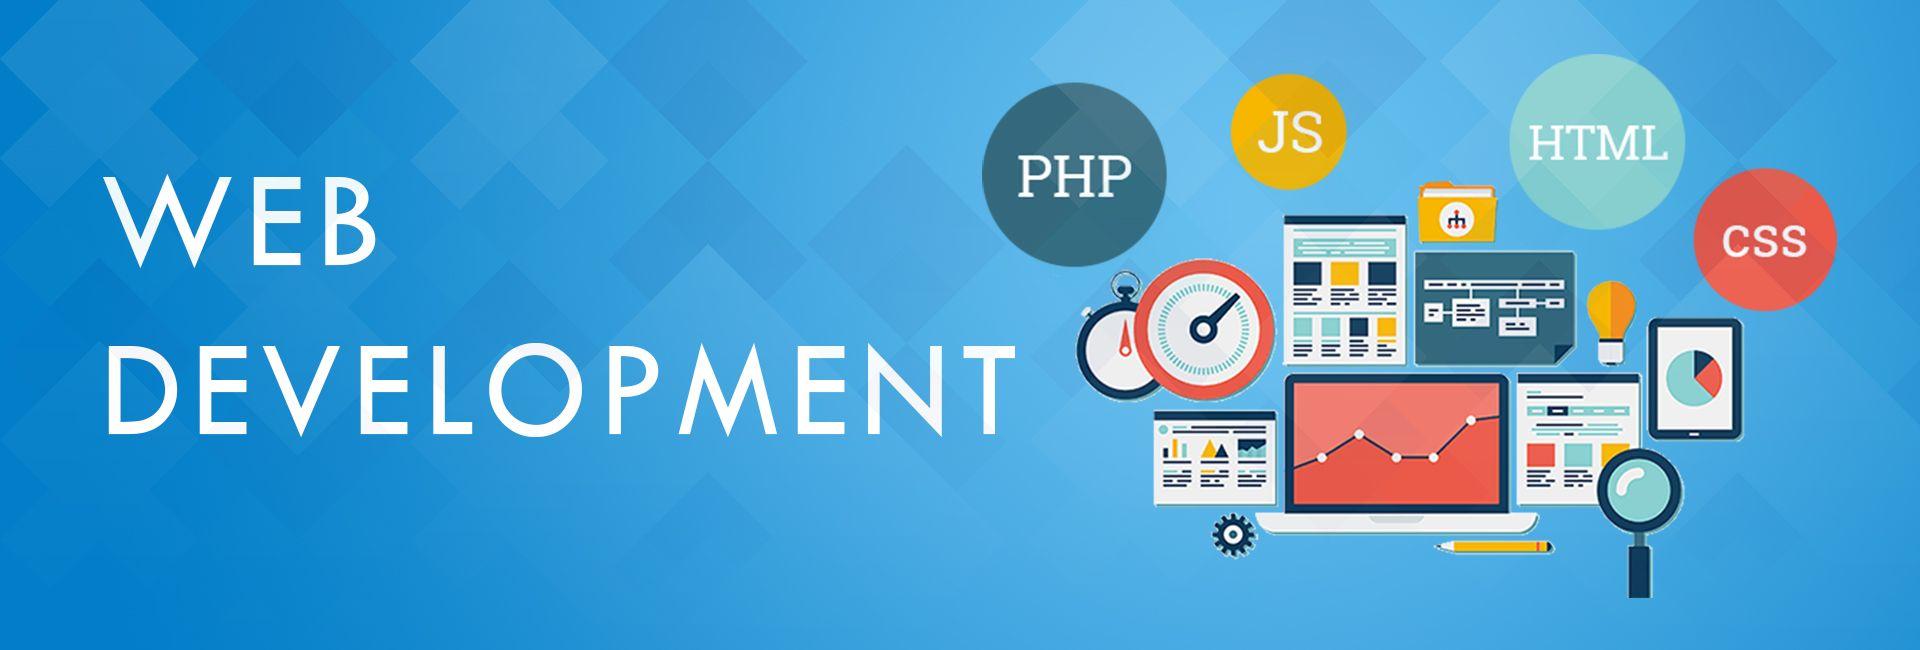 Web Design Course Details Web Design Course Web Design Web Design Company